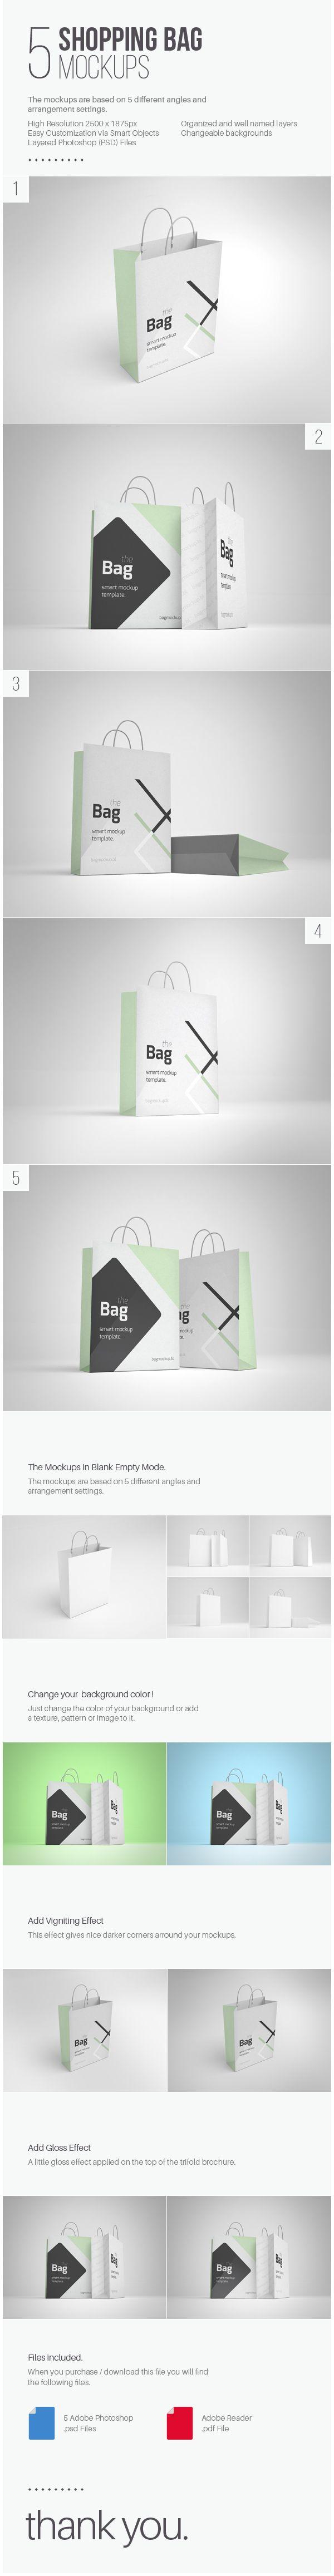 A free shopping bag mockup templates; psd & smart object.